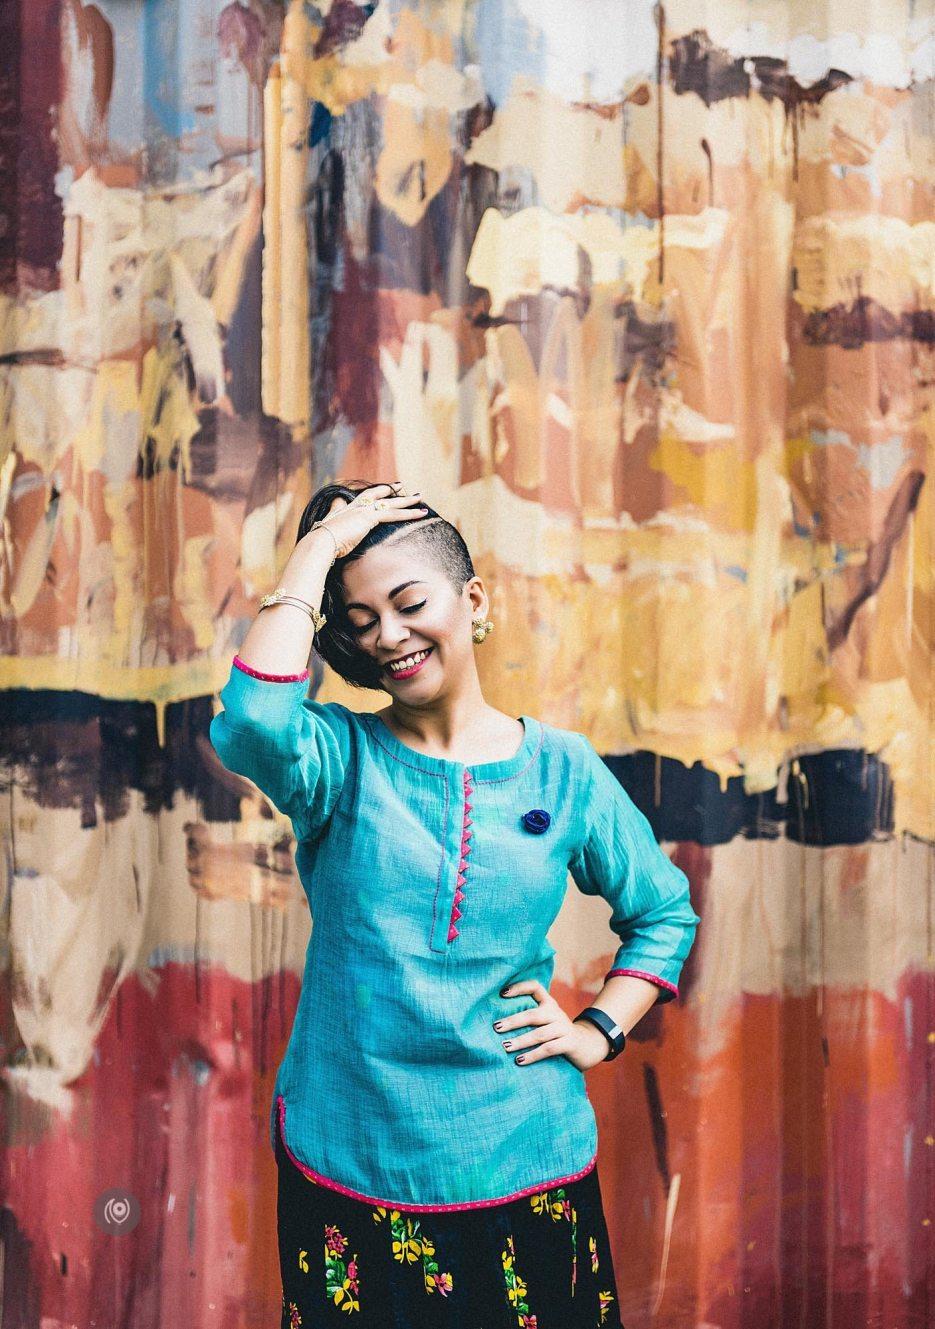 #CoverUp 64 #MadeInIndia vraj:bhoomi, Diaries of Nomad, Flying Fish Accessories, Poem Bags, Naina.co, Naina Redhu, Luxury Photographer, Lifestyle Photographer, Luxury Blogger, Lifestyle Blogger, Experience Collector, Personal Style, #MadeInIndia, #CoverUp